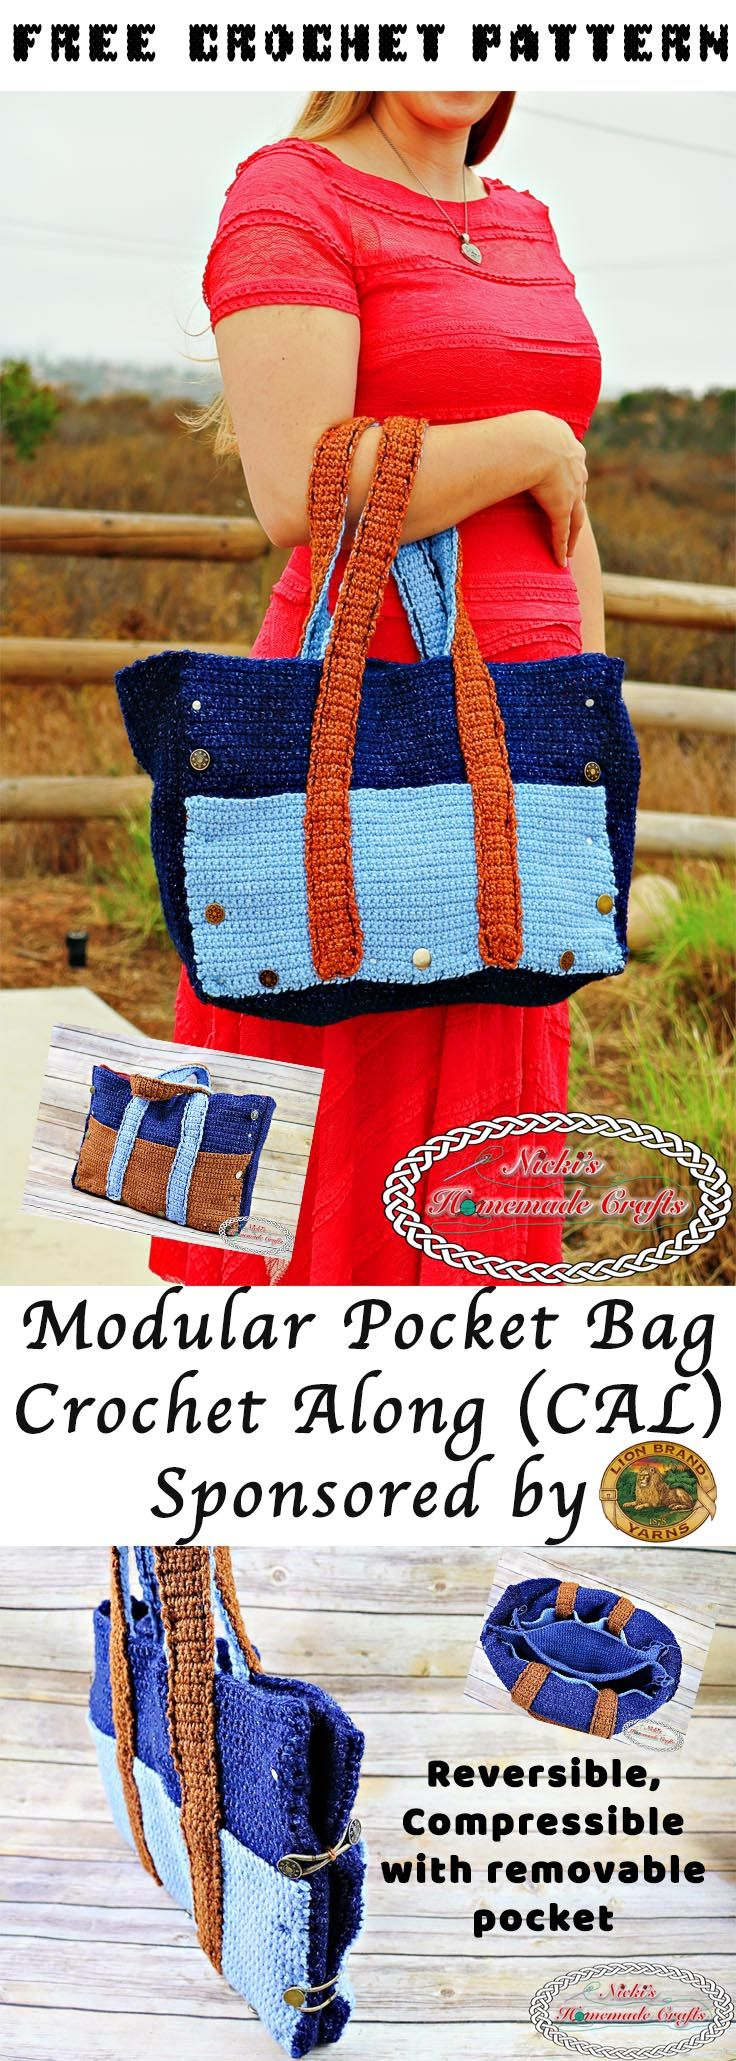 The Modular Pocket Bag Crochet Along (CAL) - Part 1 | Patrones ...